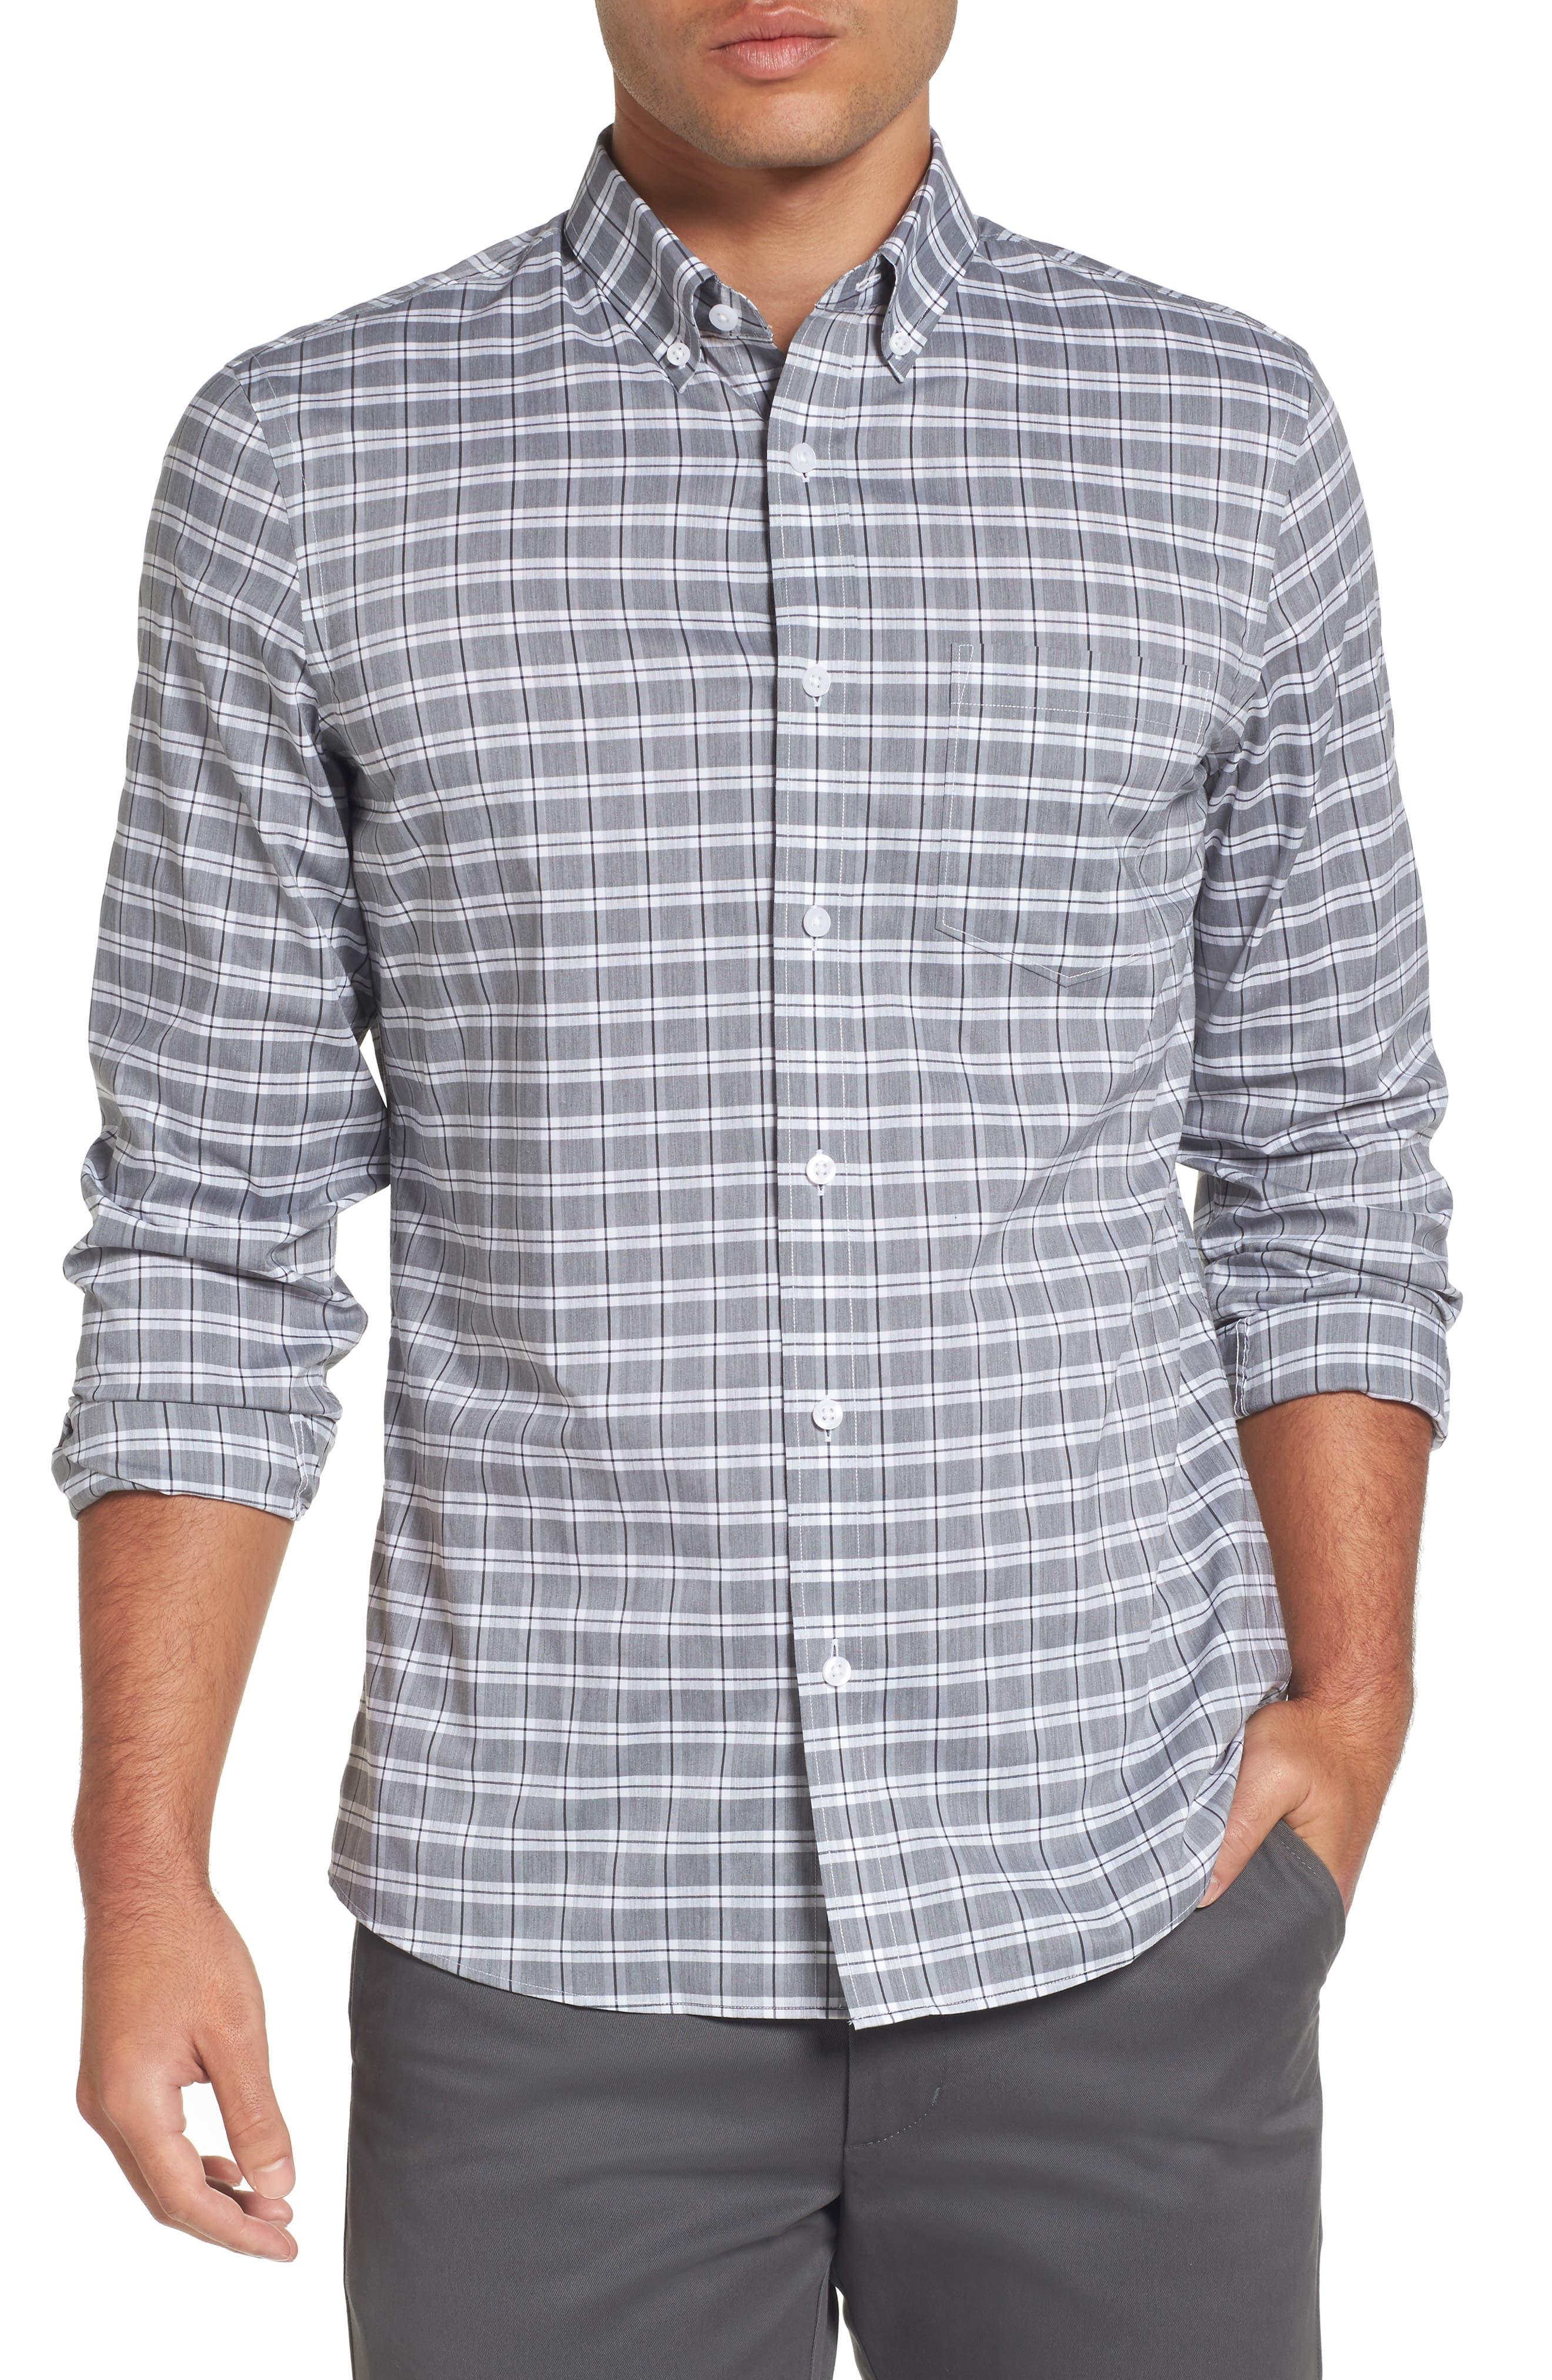 Trim Fit Tech-Smart Heather Check Sport Shirt,                         Main,                         color, Grey Shade Heather Check